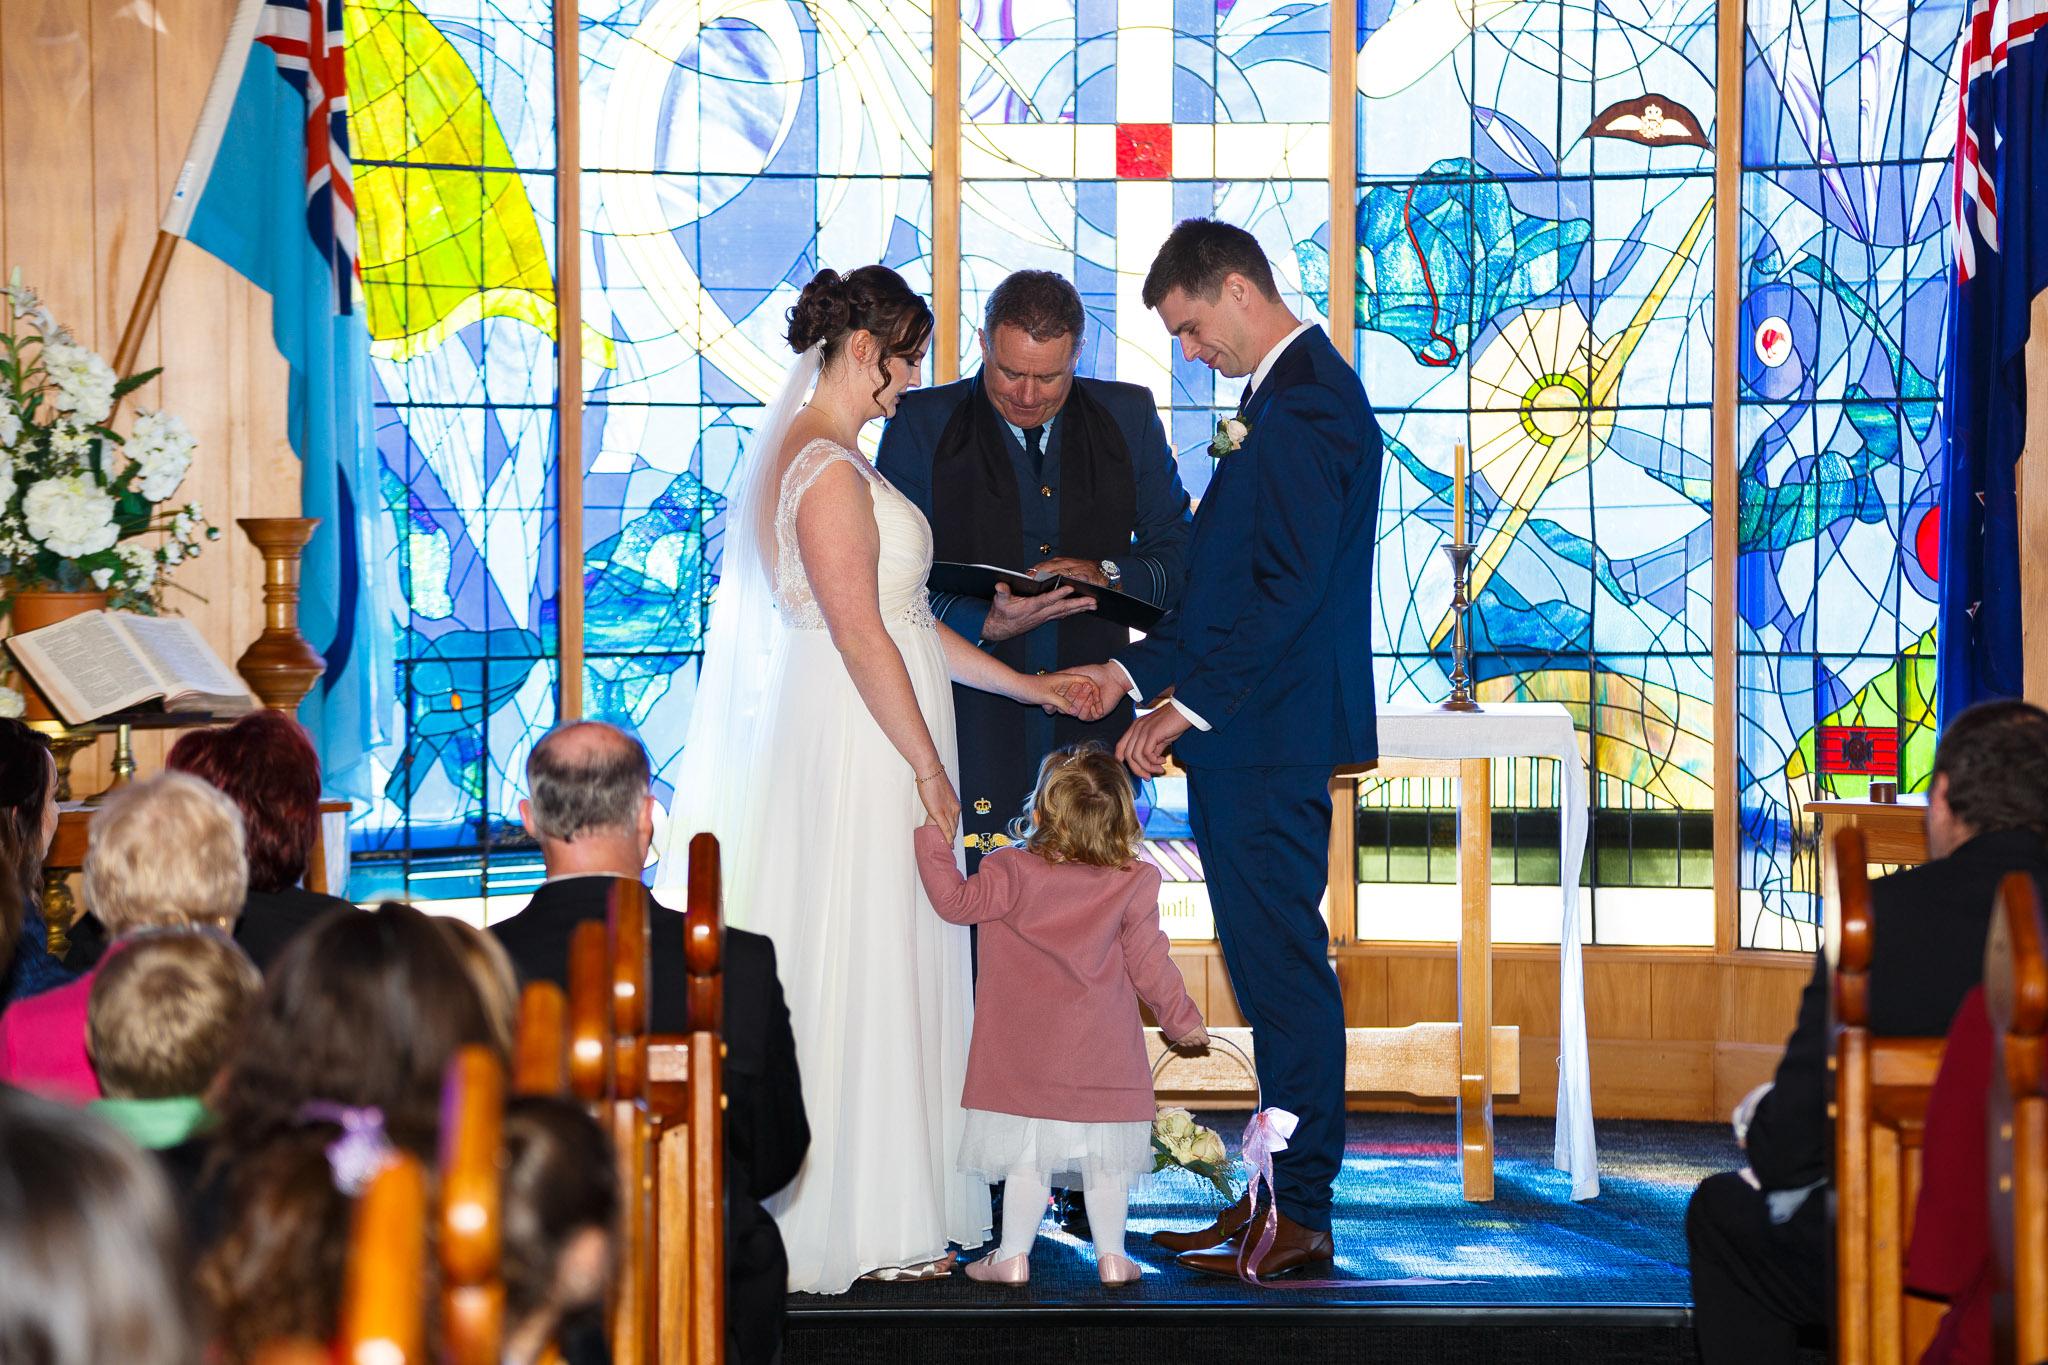 highlight_wedding_photography_manawatu_palmerston_north_new_zealand_rangitikei_golf_ohakea-20.jpg